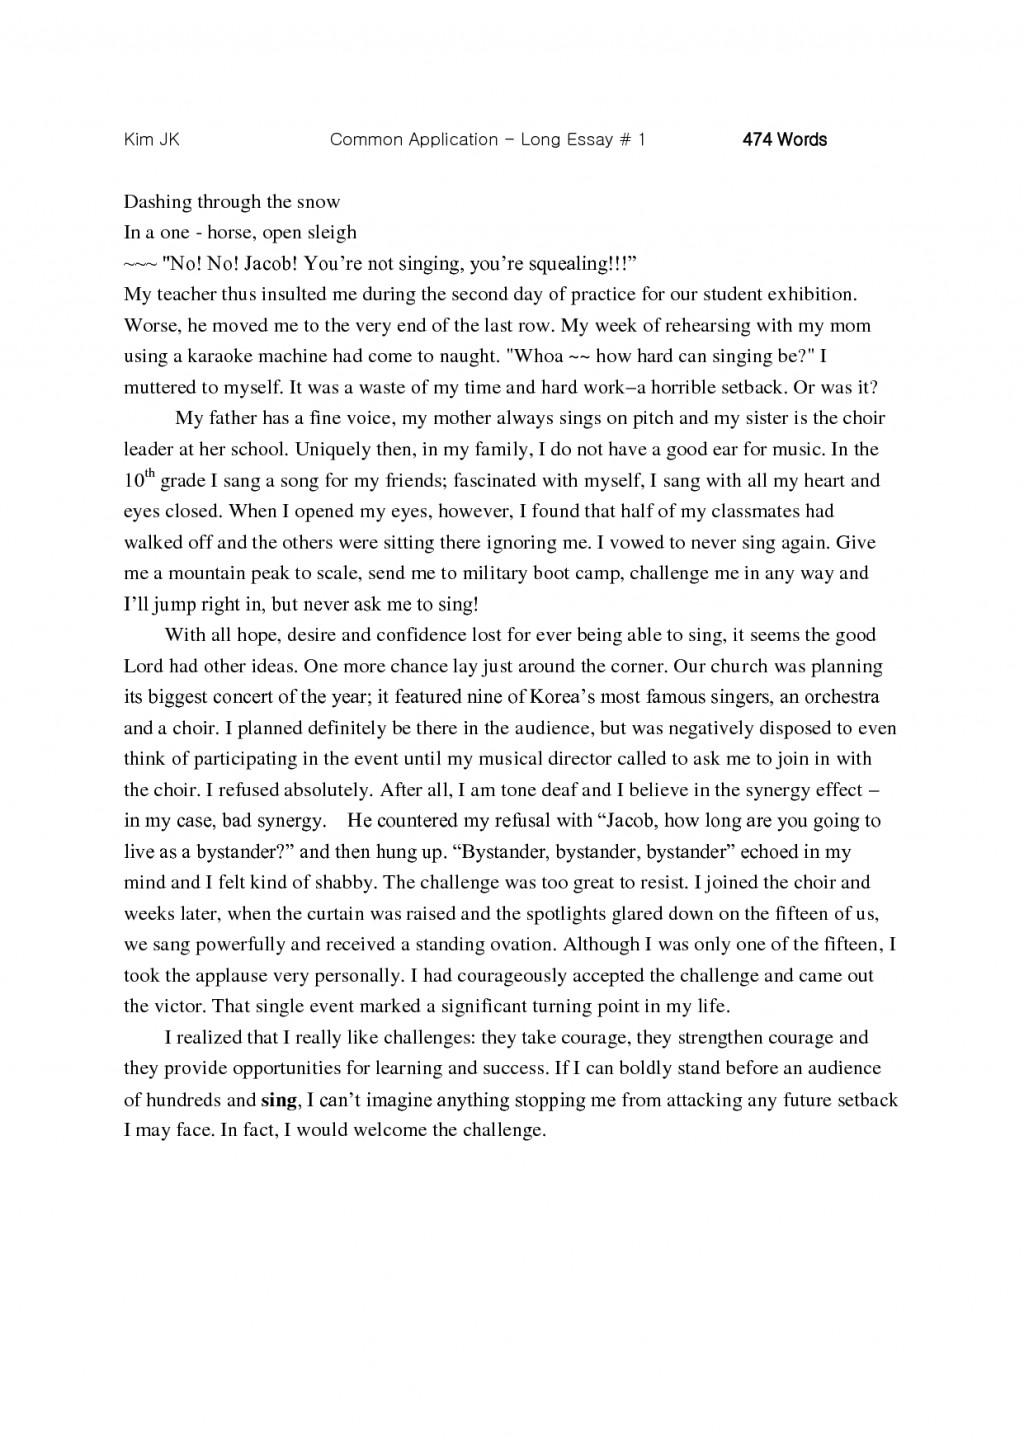 005 Good Common App Essays Resume Writing Application Essay Help Cnessayjuvi Example Unusual Prompt Examples 6 1 Sample Large